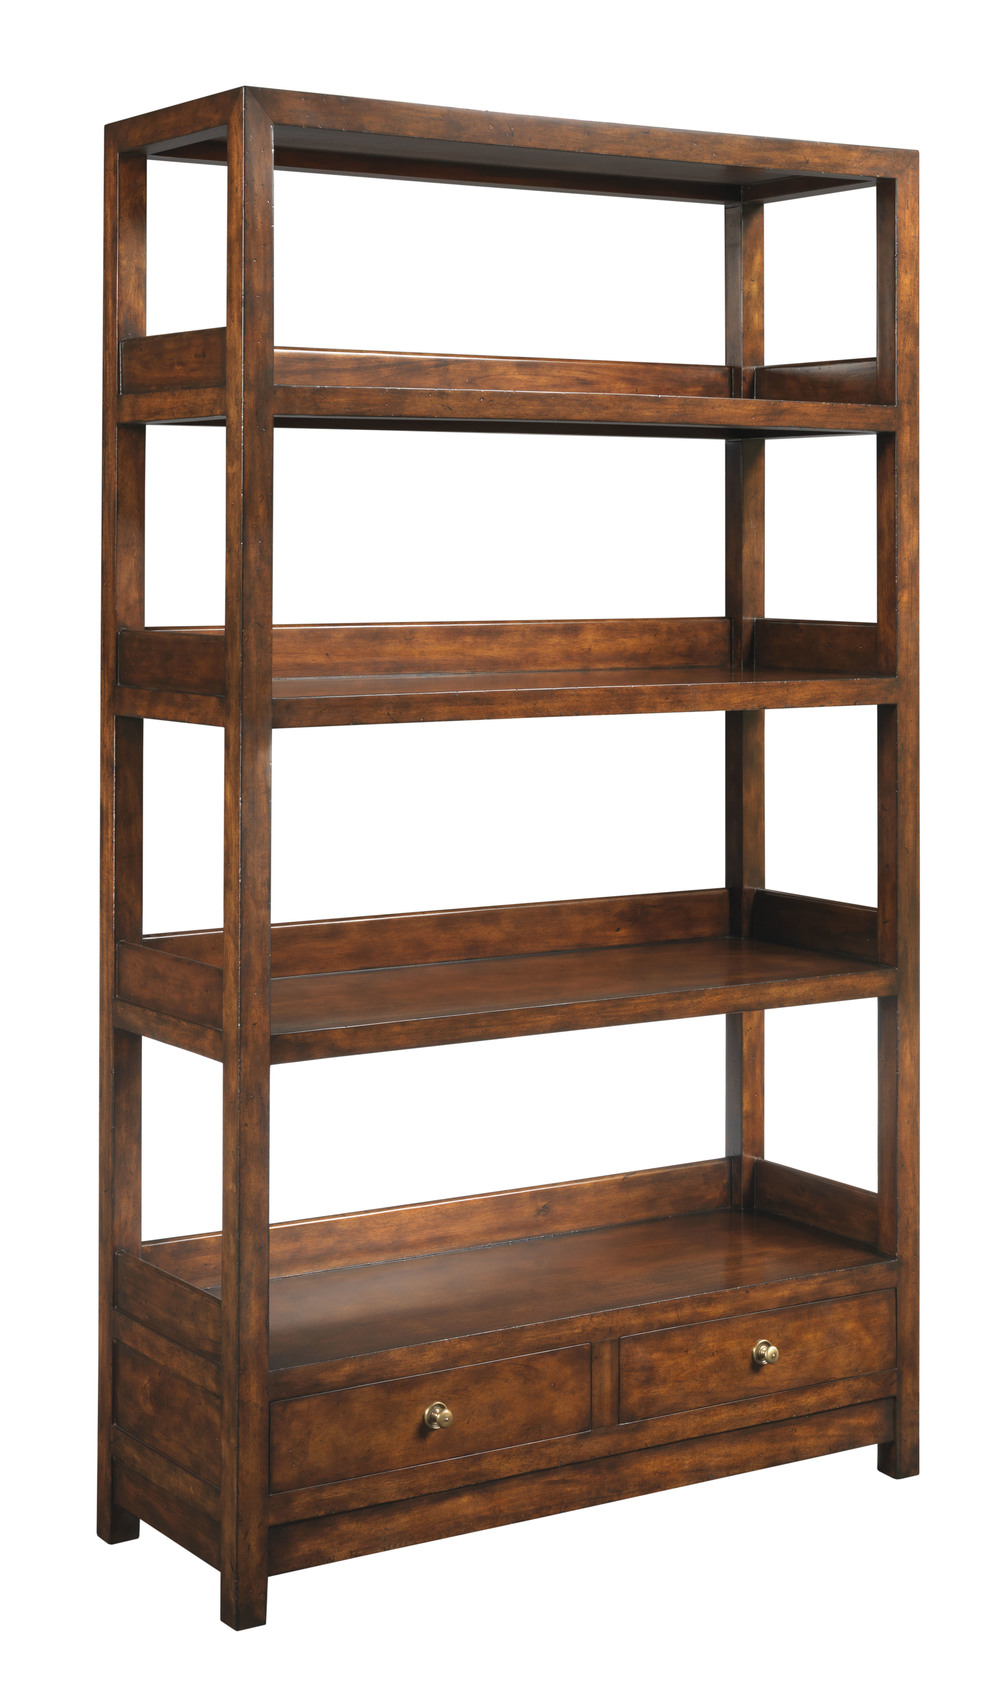 Woodbridge Furniture Company - Winslow Bookcase